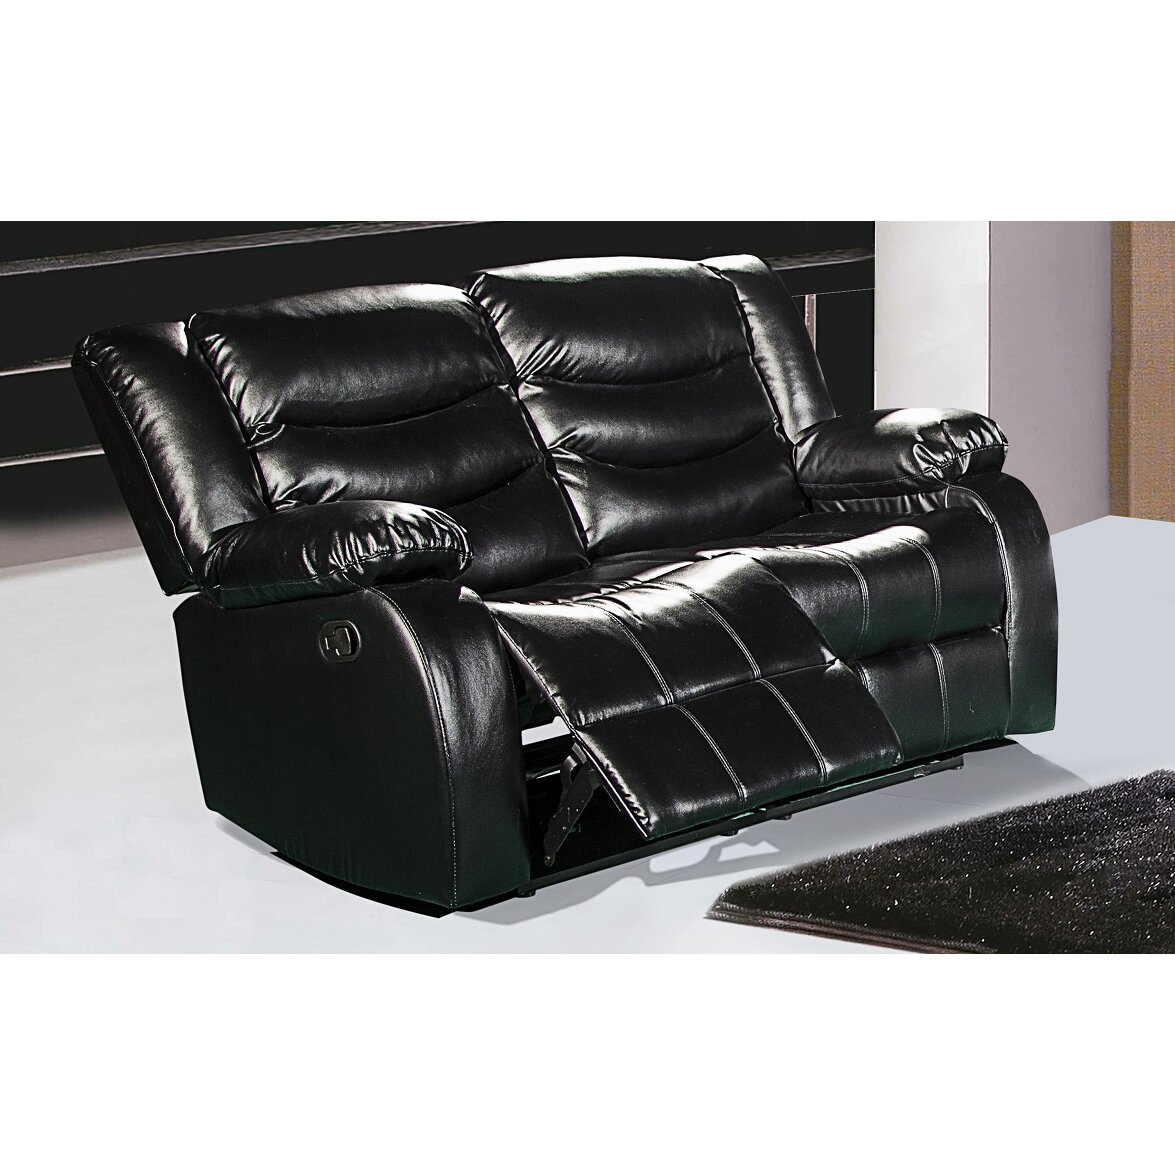 Meridian furniture usa reclining loveseat reviews wayfair for Furniture usa